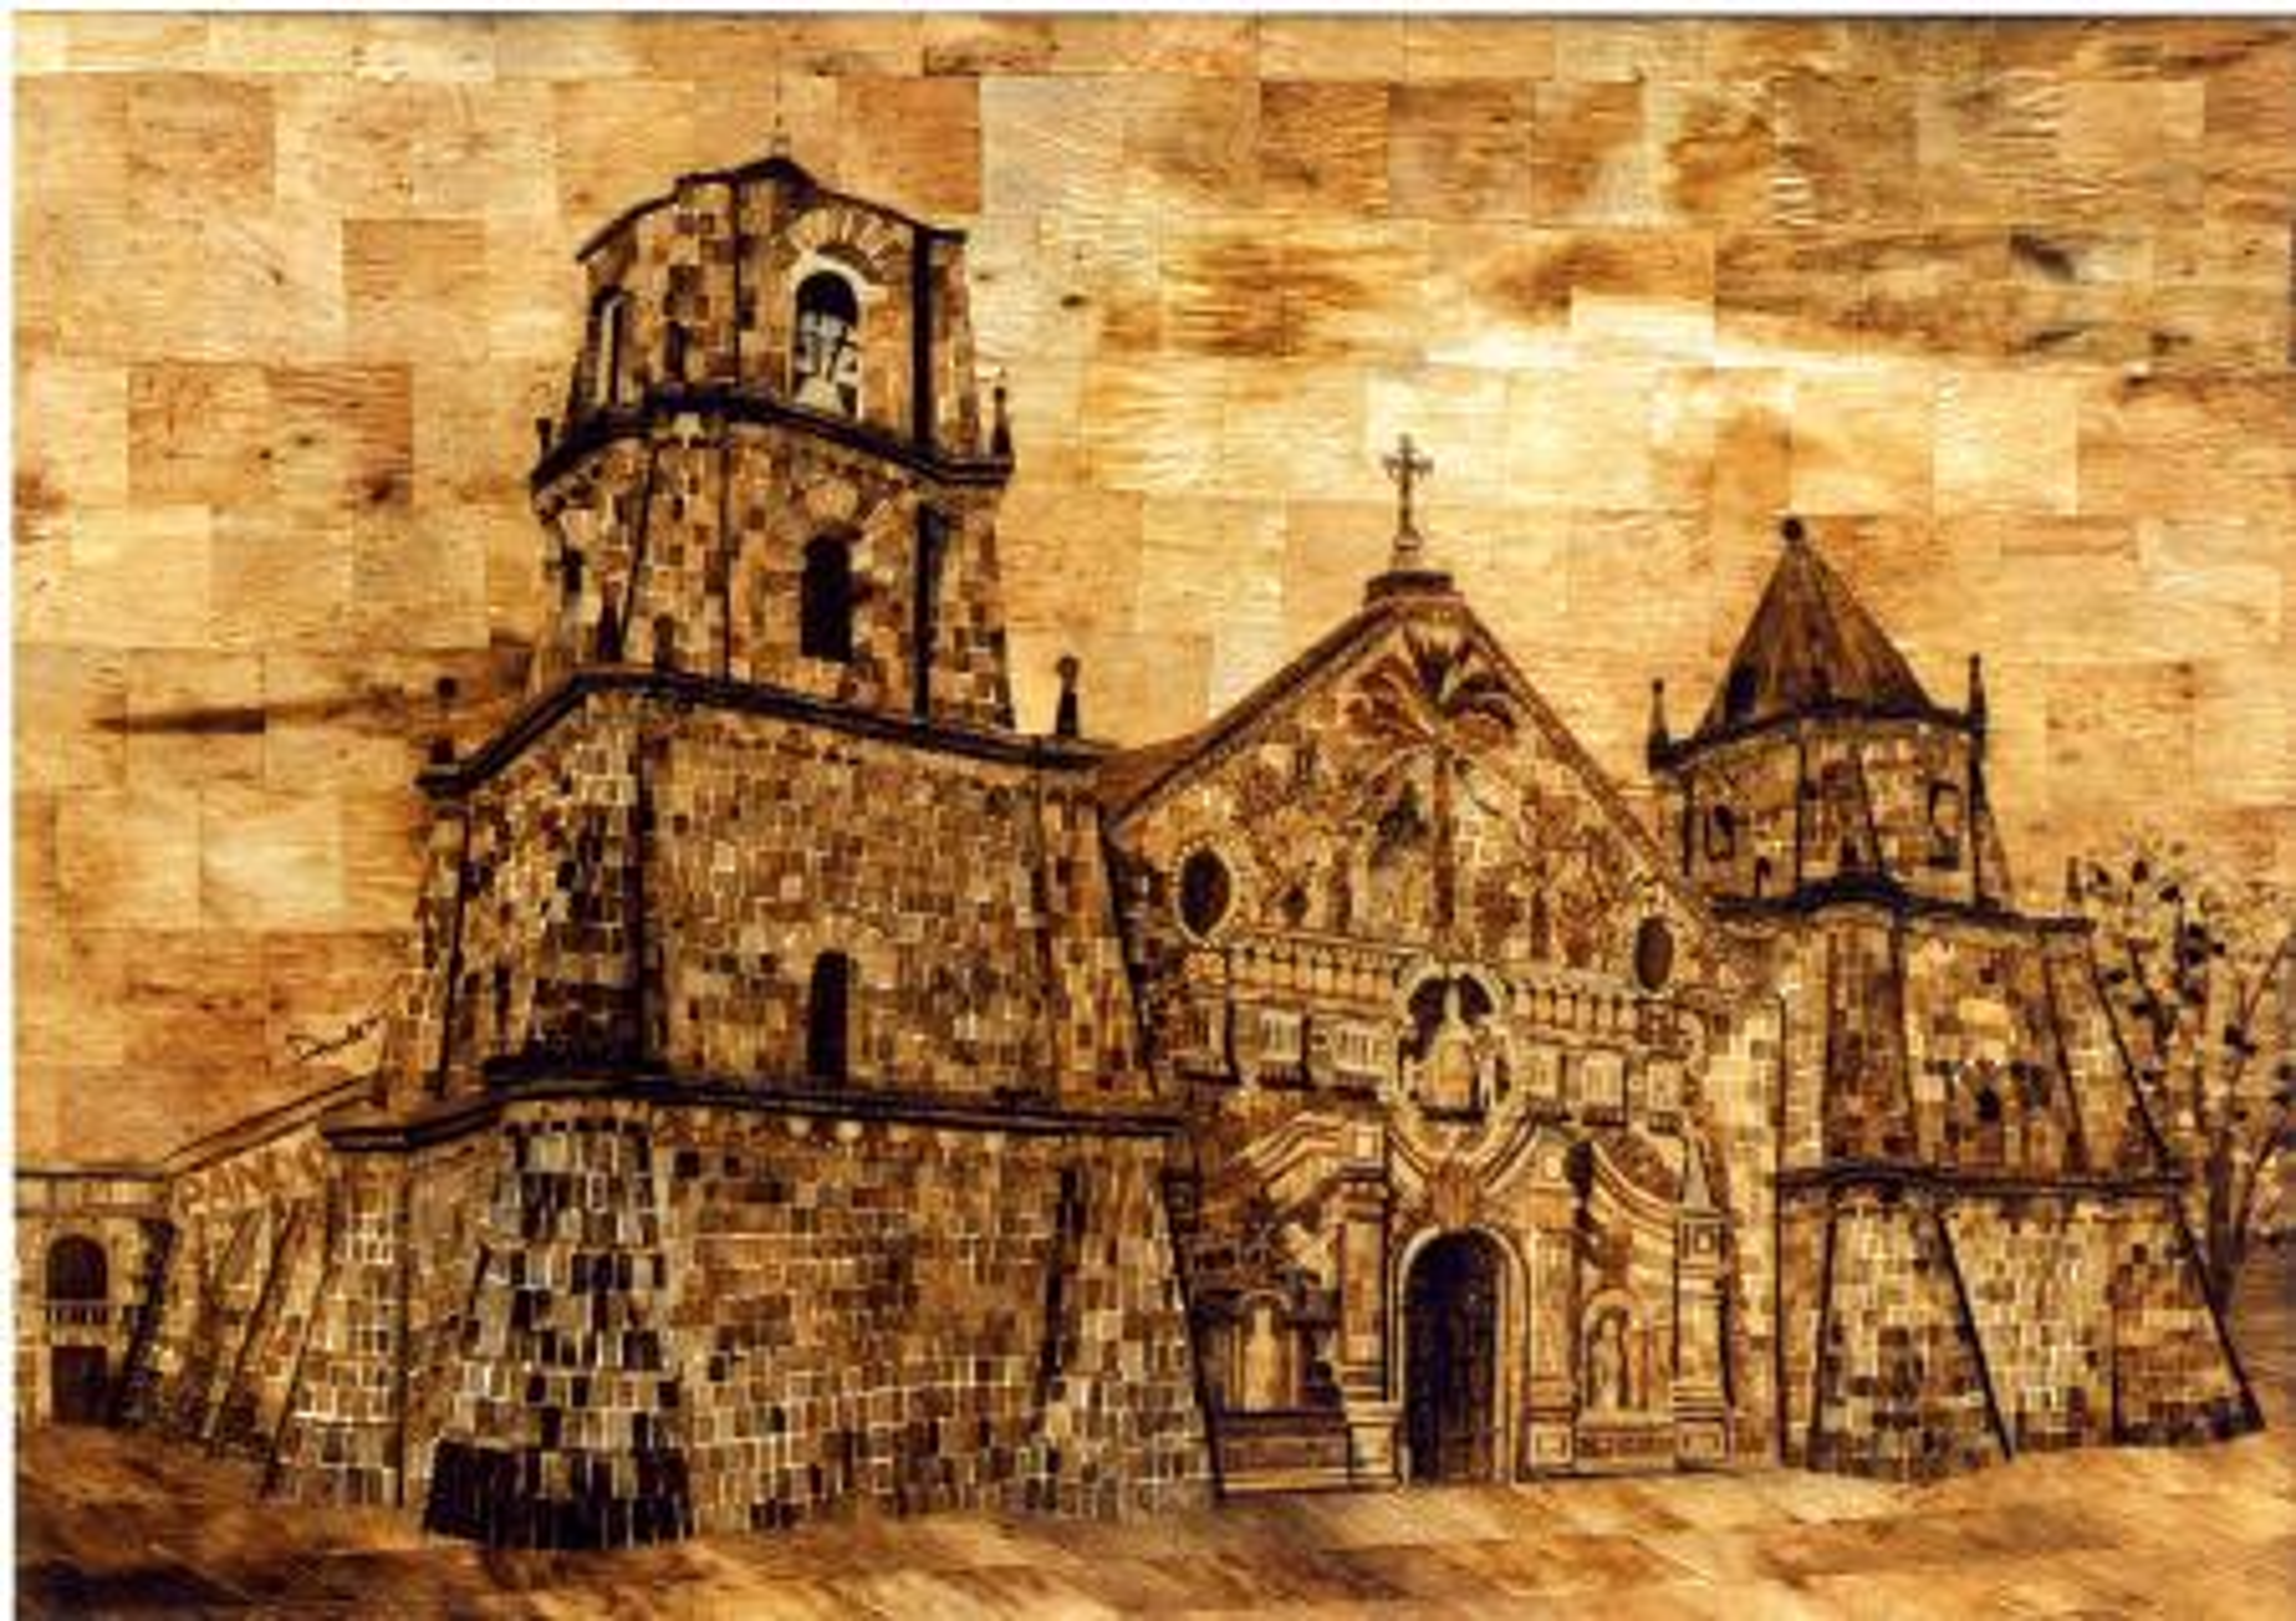 Miagao Church Philippines